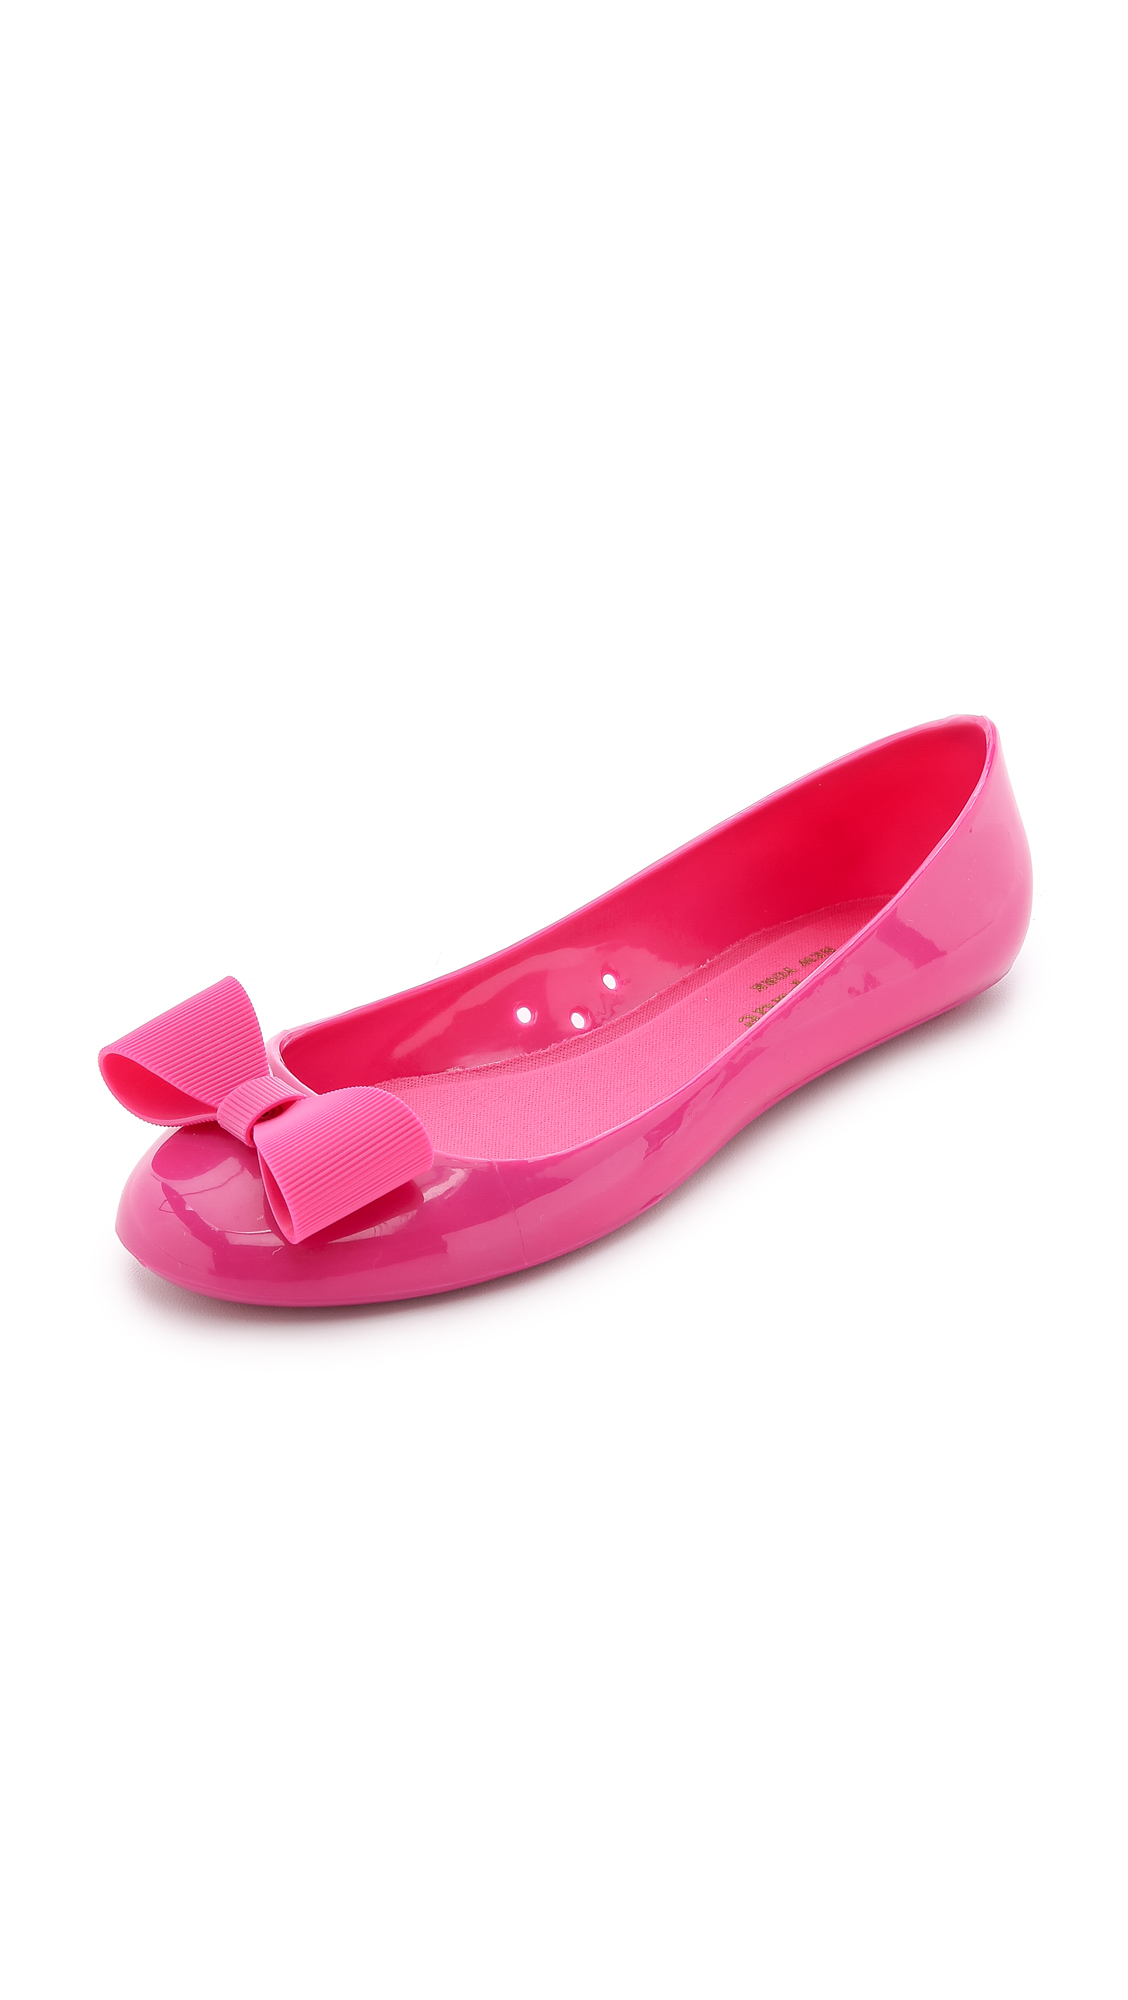 c01fe4ba2a6e Lyst - Kate Spade Jove Ballet Flats - Smoke in Pink